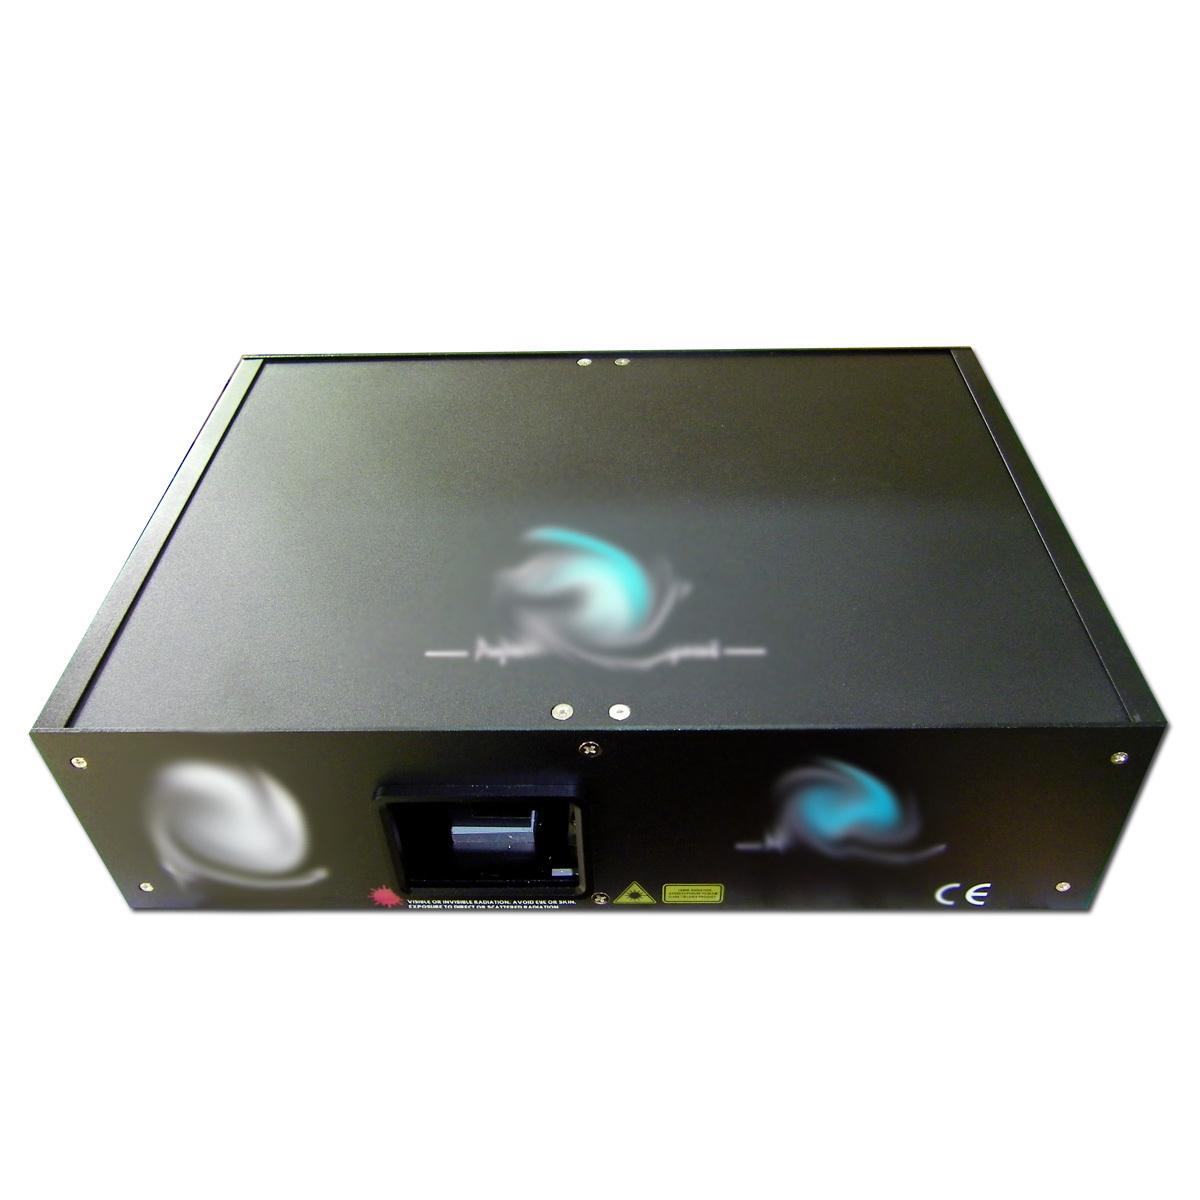 Ag 500 single green laser light 500mw animation laser light bar laser light ktv laser light(China (Mainland))